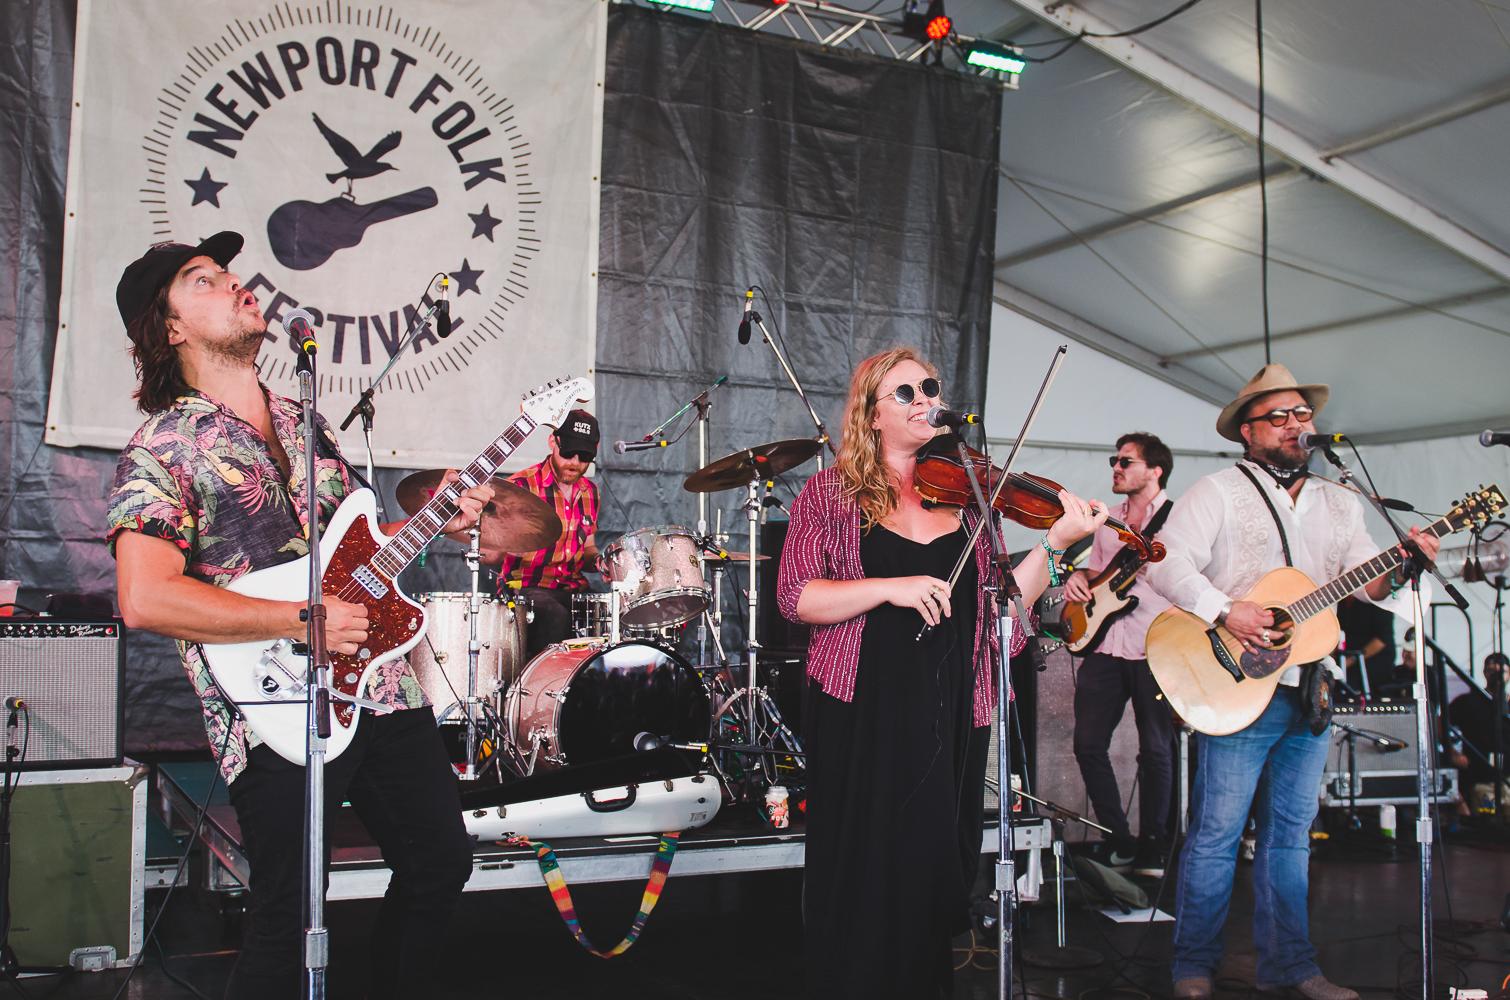 Newport Folk Festival 2018 Ben Kaye-Glorietta